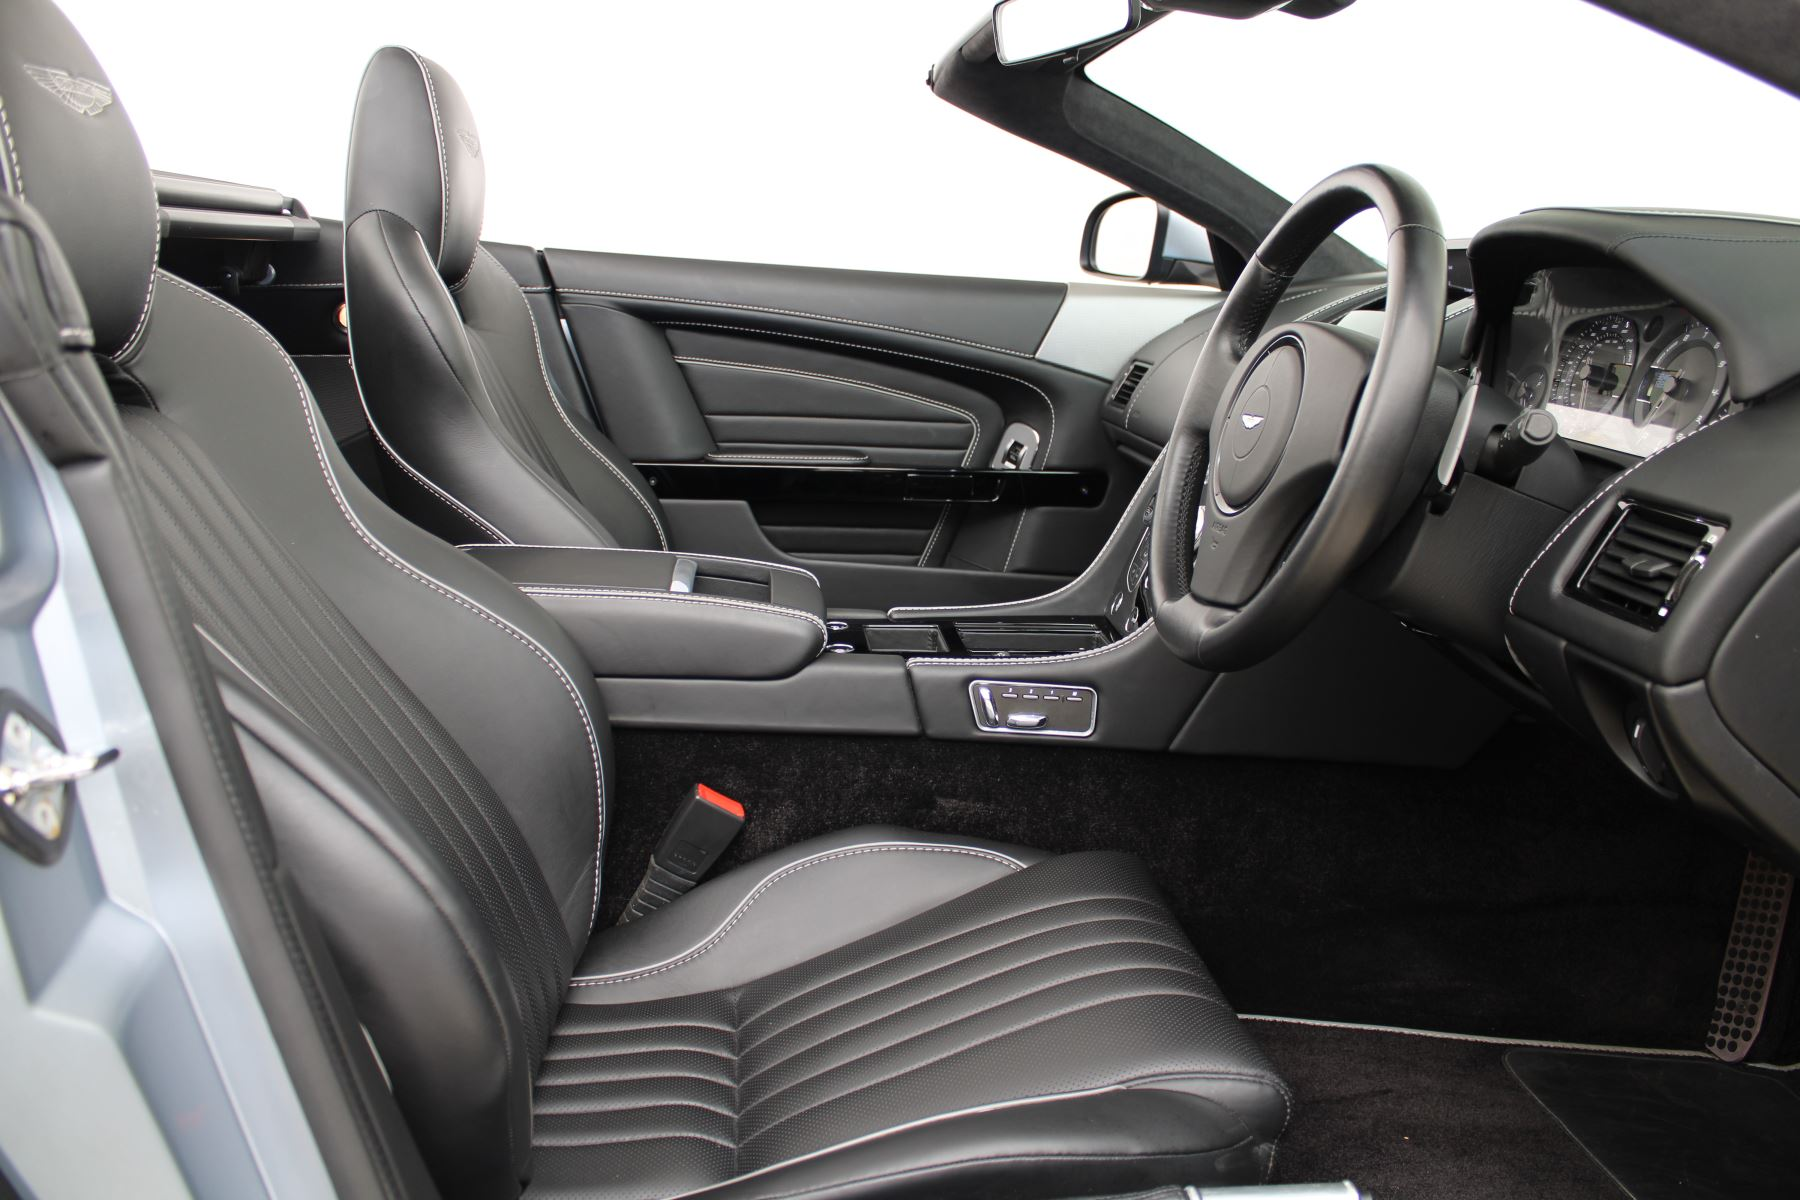 Aston Martin DB9 V12 GT 2dr Volante Skyfall Silver image 18